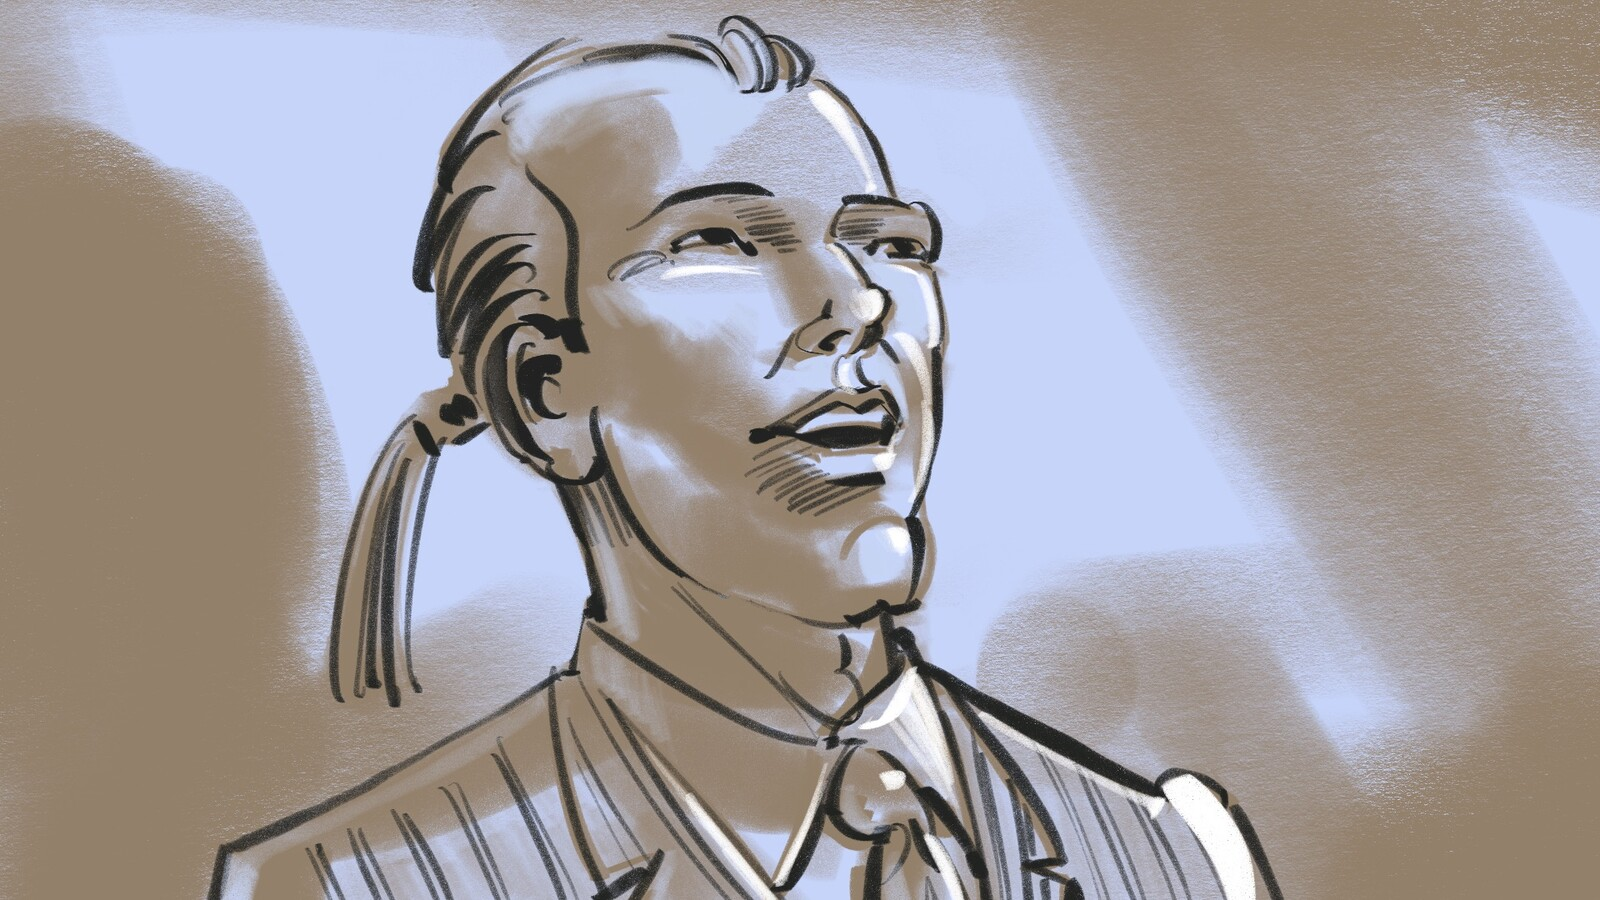 FRAME #47-CU-Med-Floating: INT. Raek greets him with a magnanimous smile.